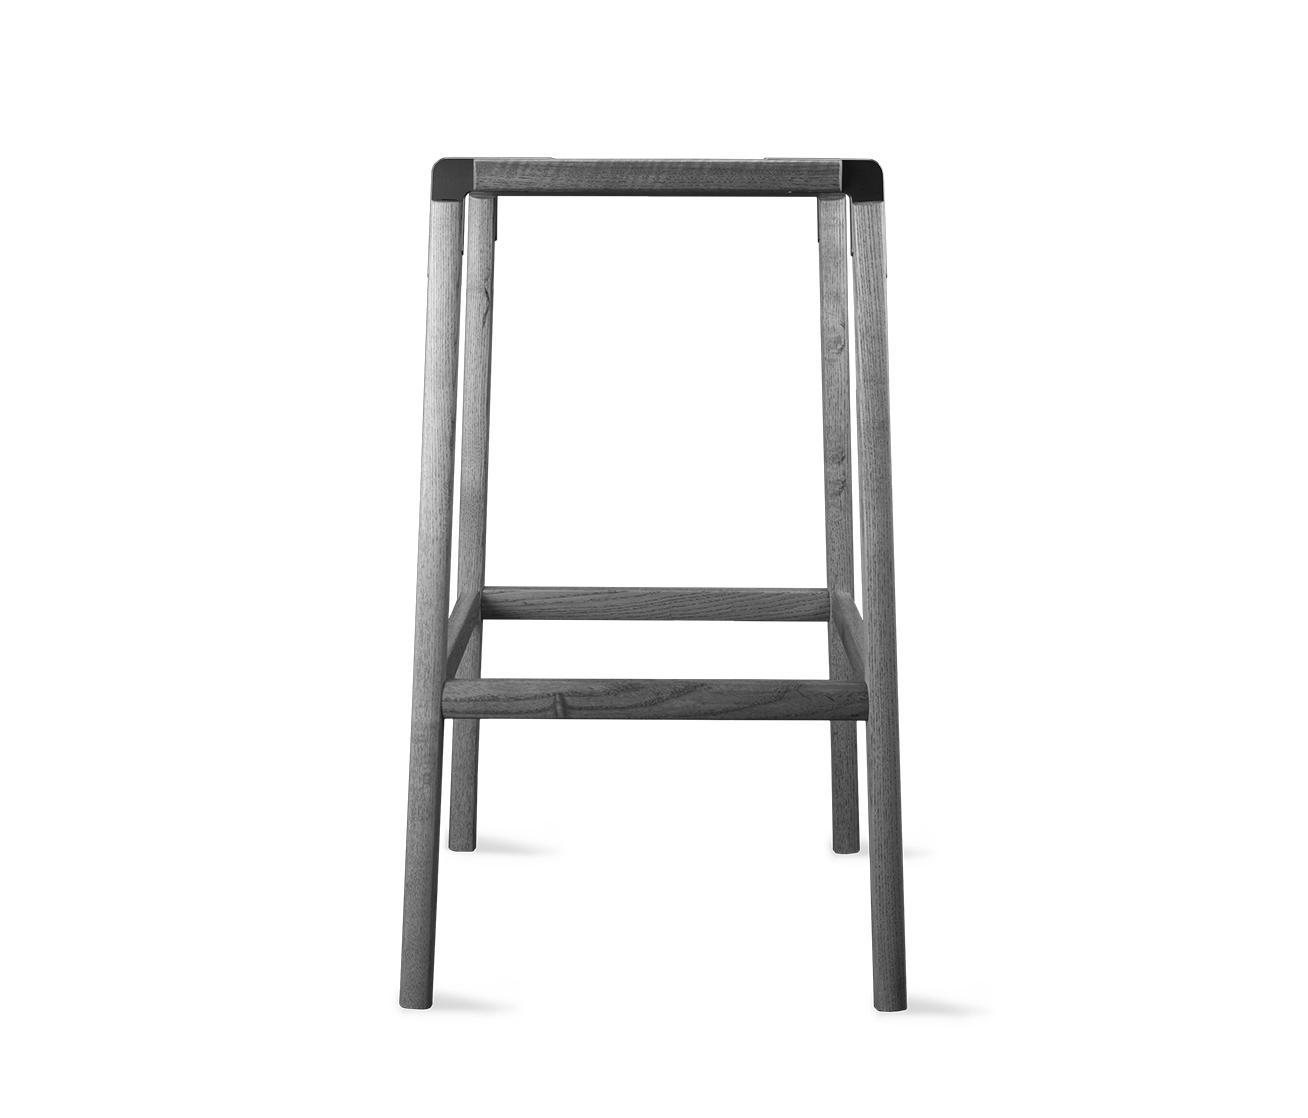 Bartlett backless bar stool barhocker von fyrn architonic for Barhocker englisch